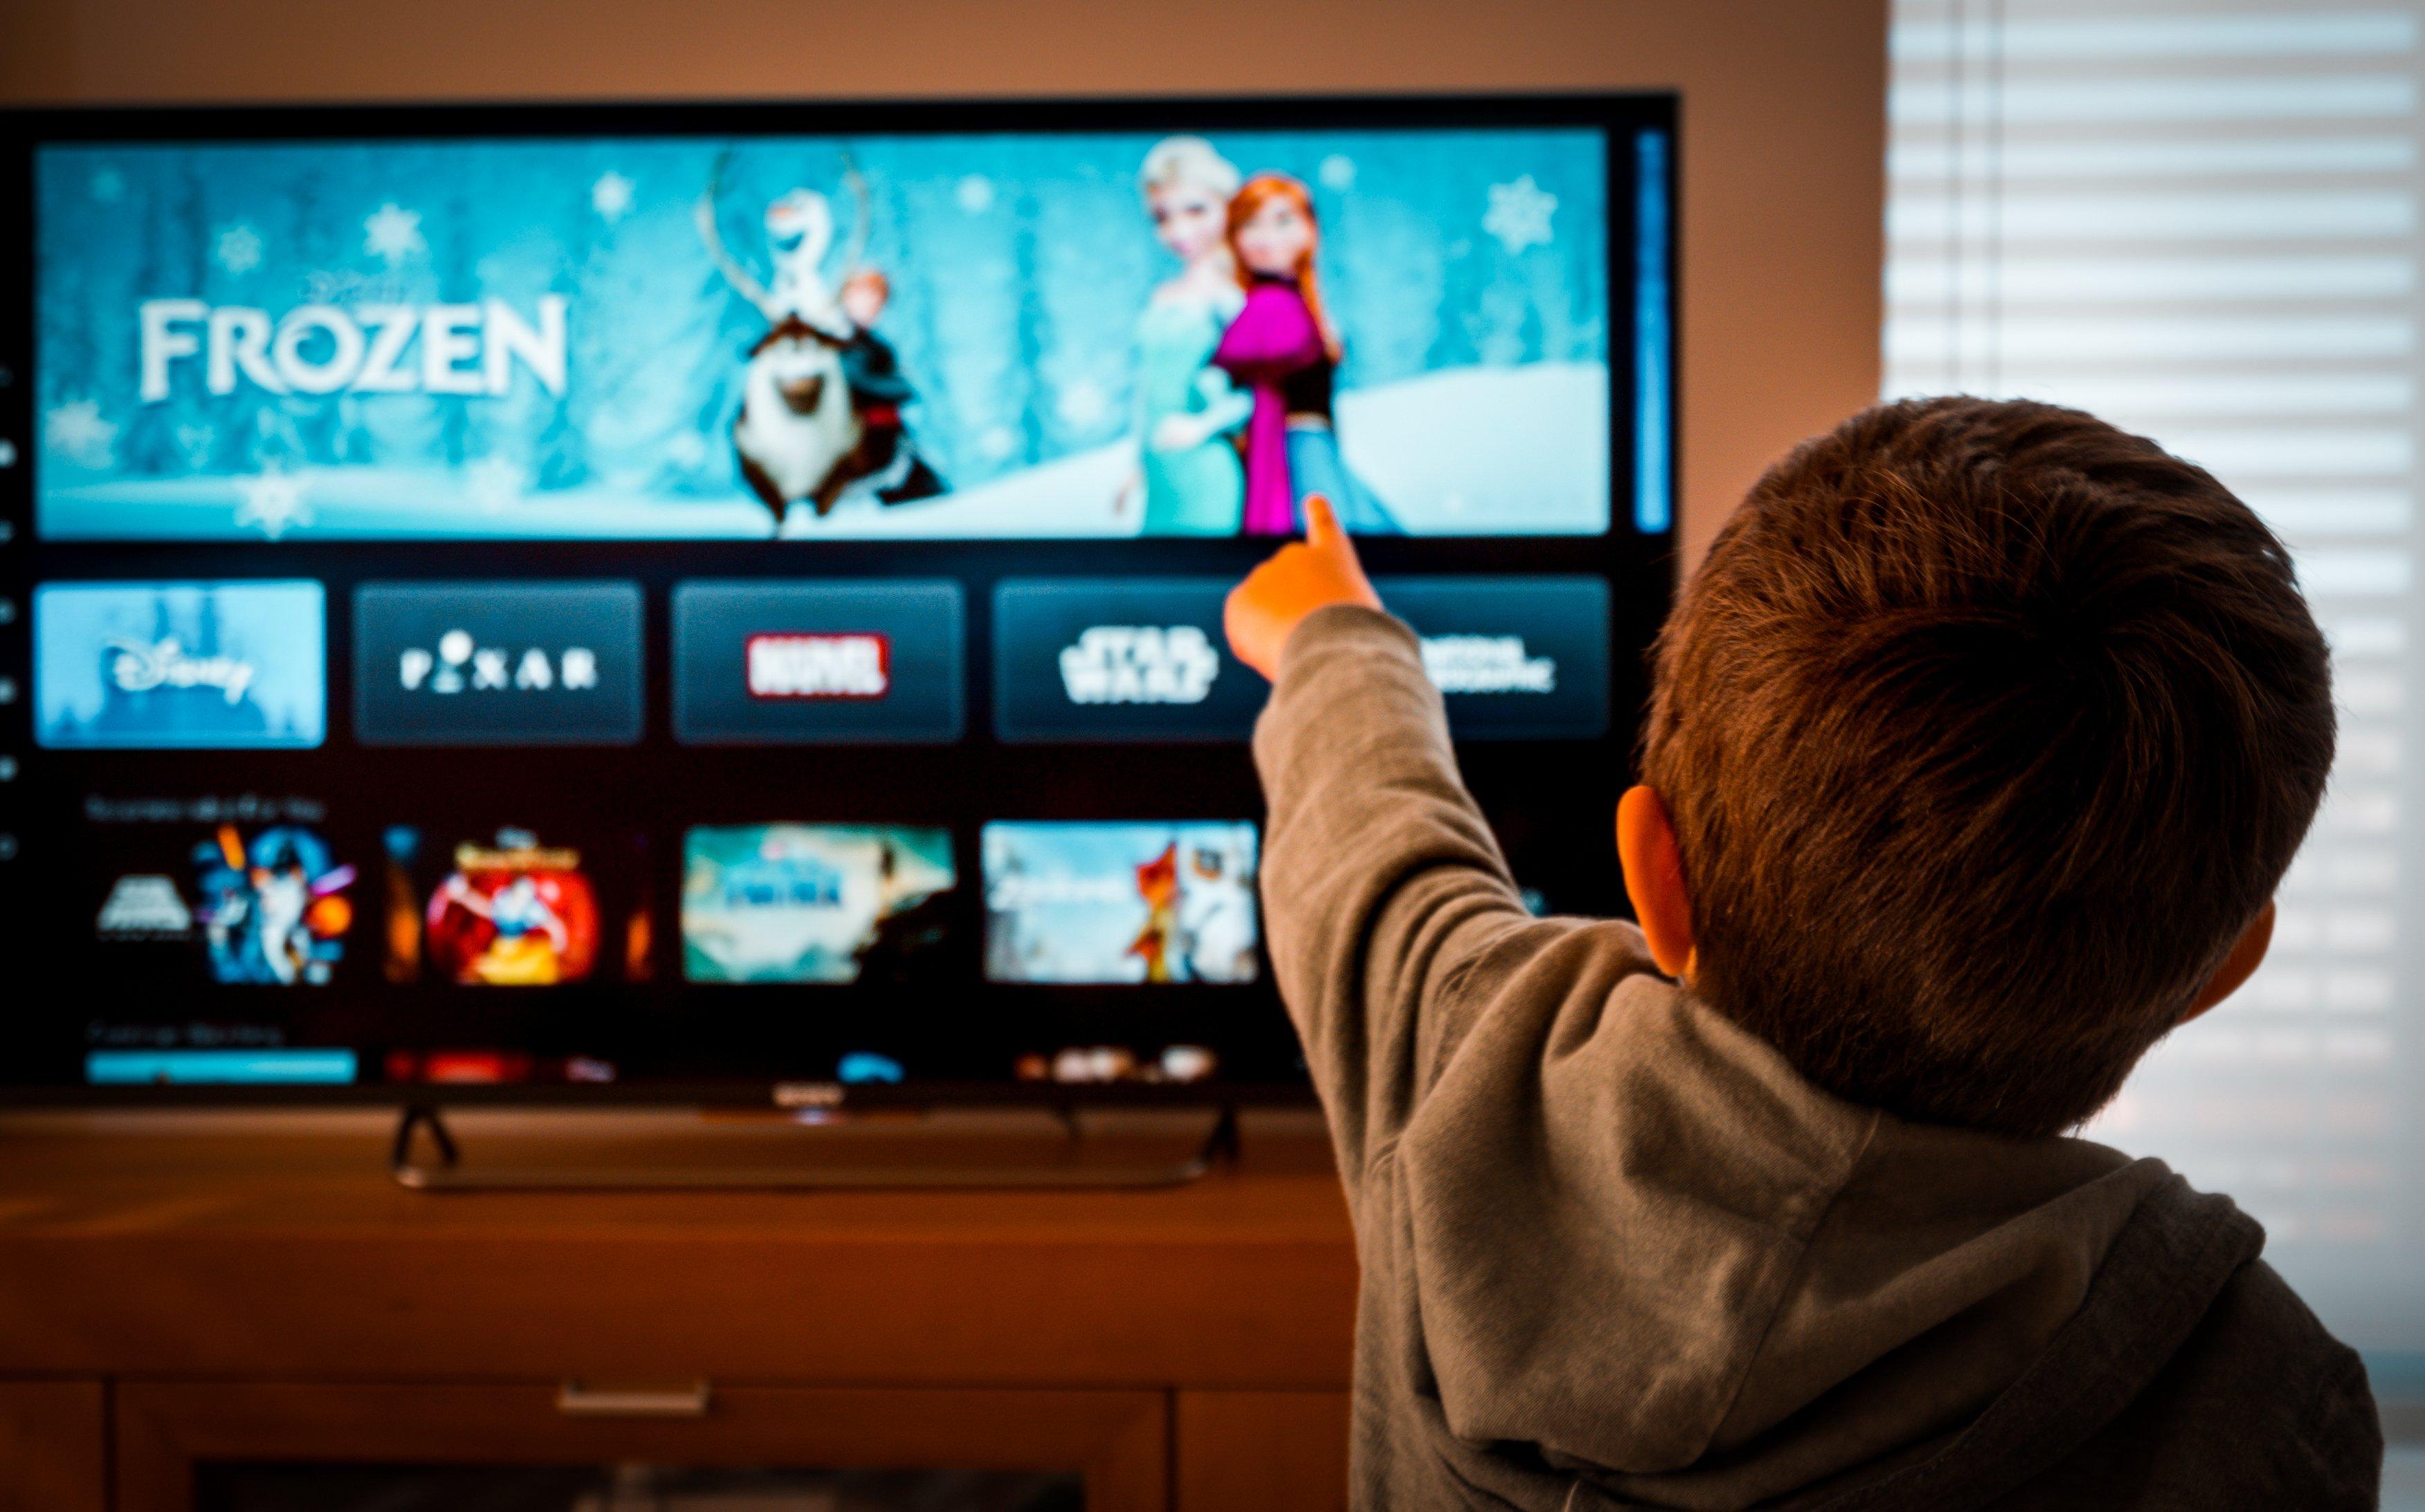 covid-19 telecom market research streaming video